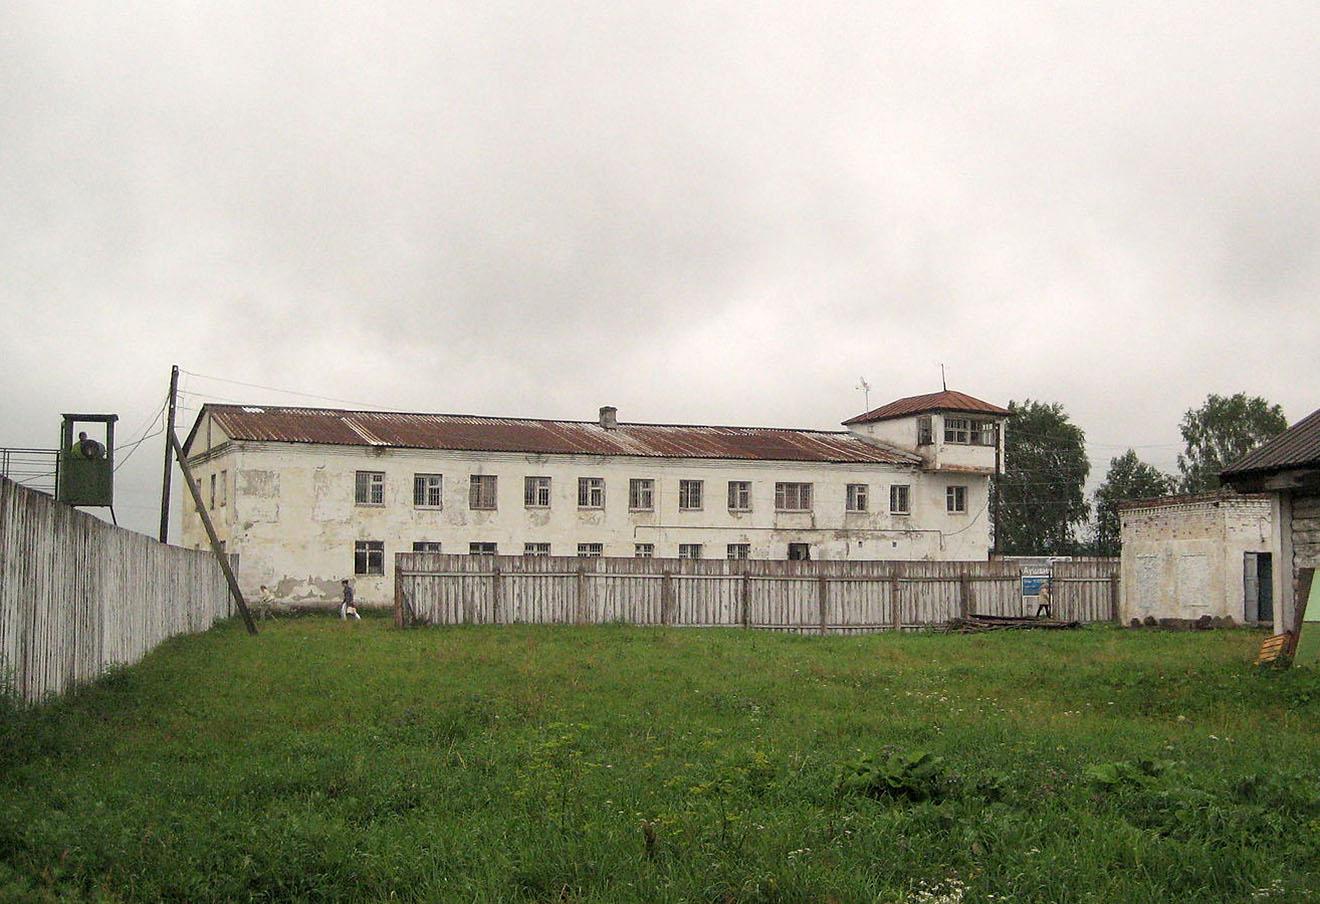 Пермь-36, Фото: Gerald Praschl / Wikipedia